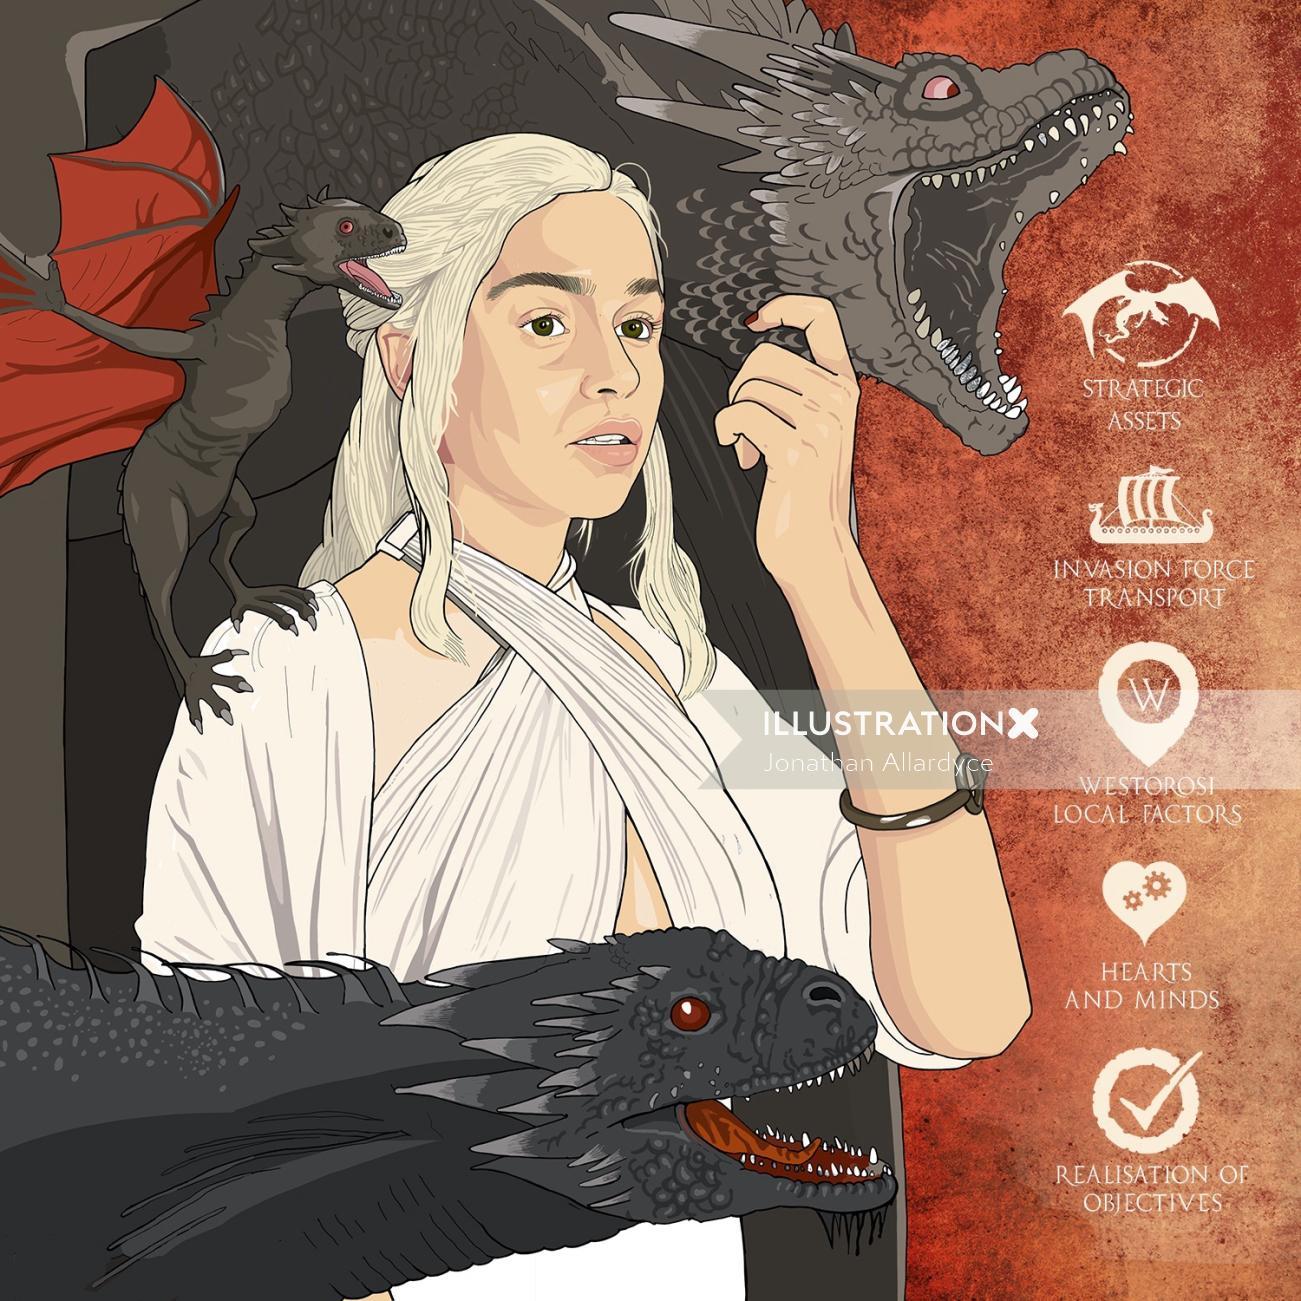 Daenerys Targaryen illustration